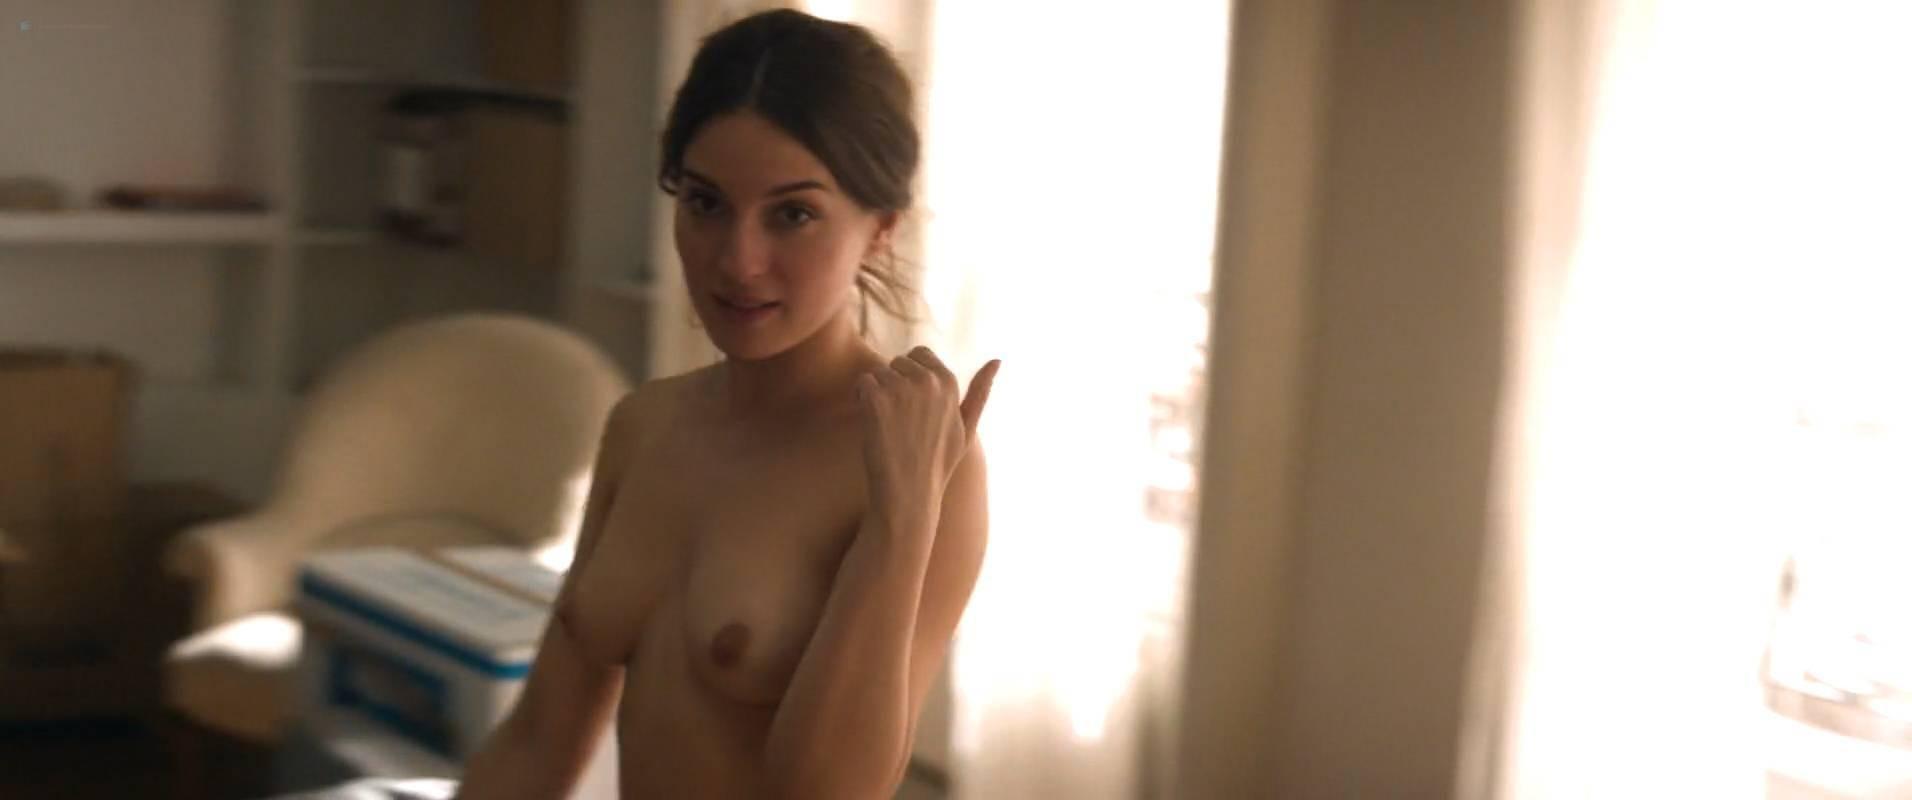 Maria Valverde desnudarse